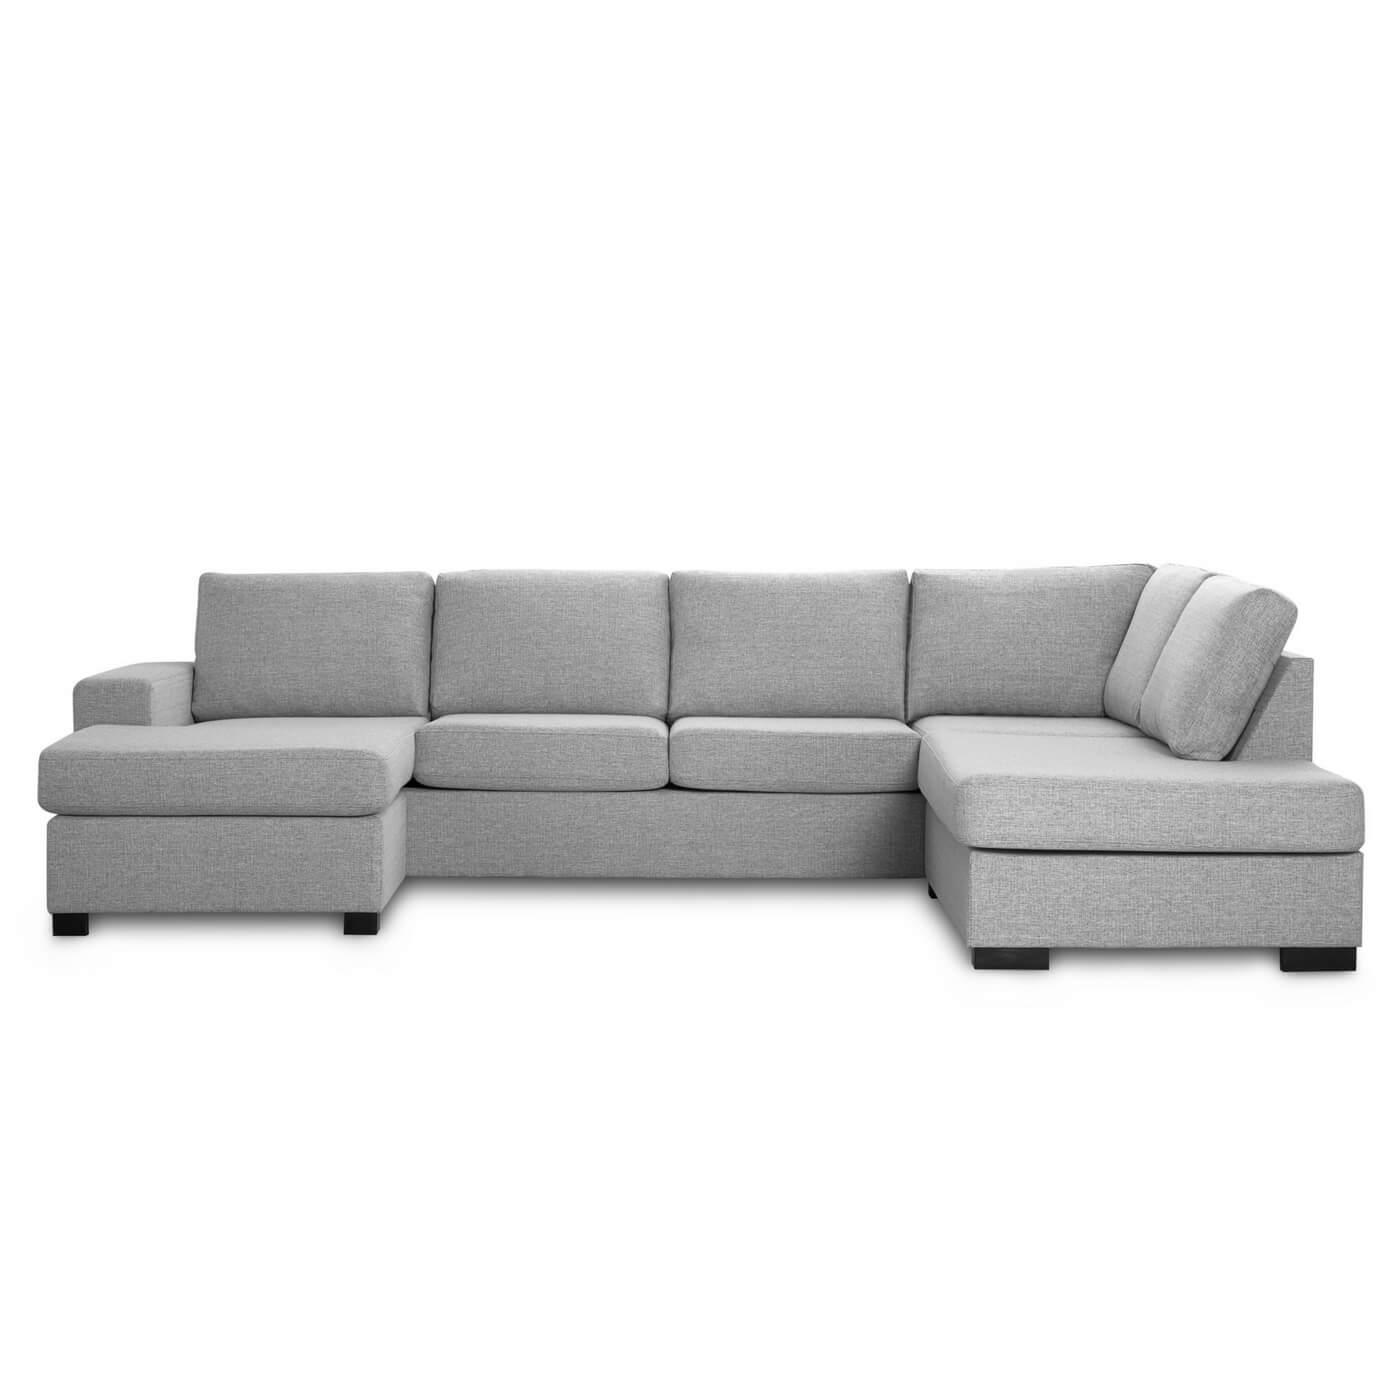 Milan højrevendt U-sofa - lys granitgrå stof